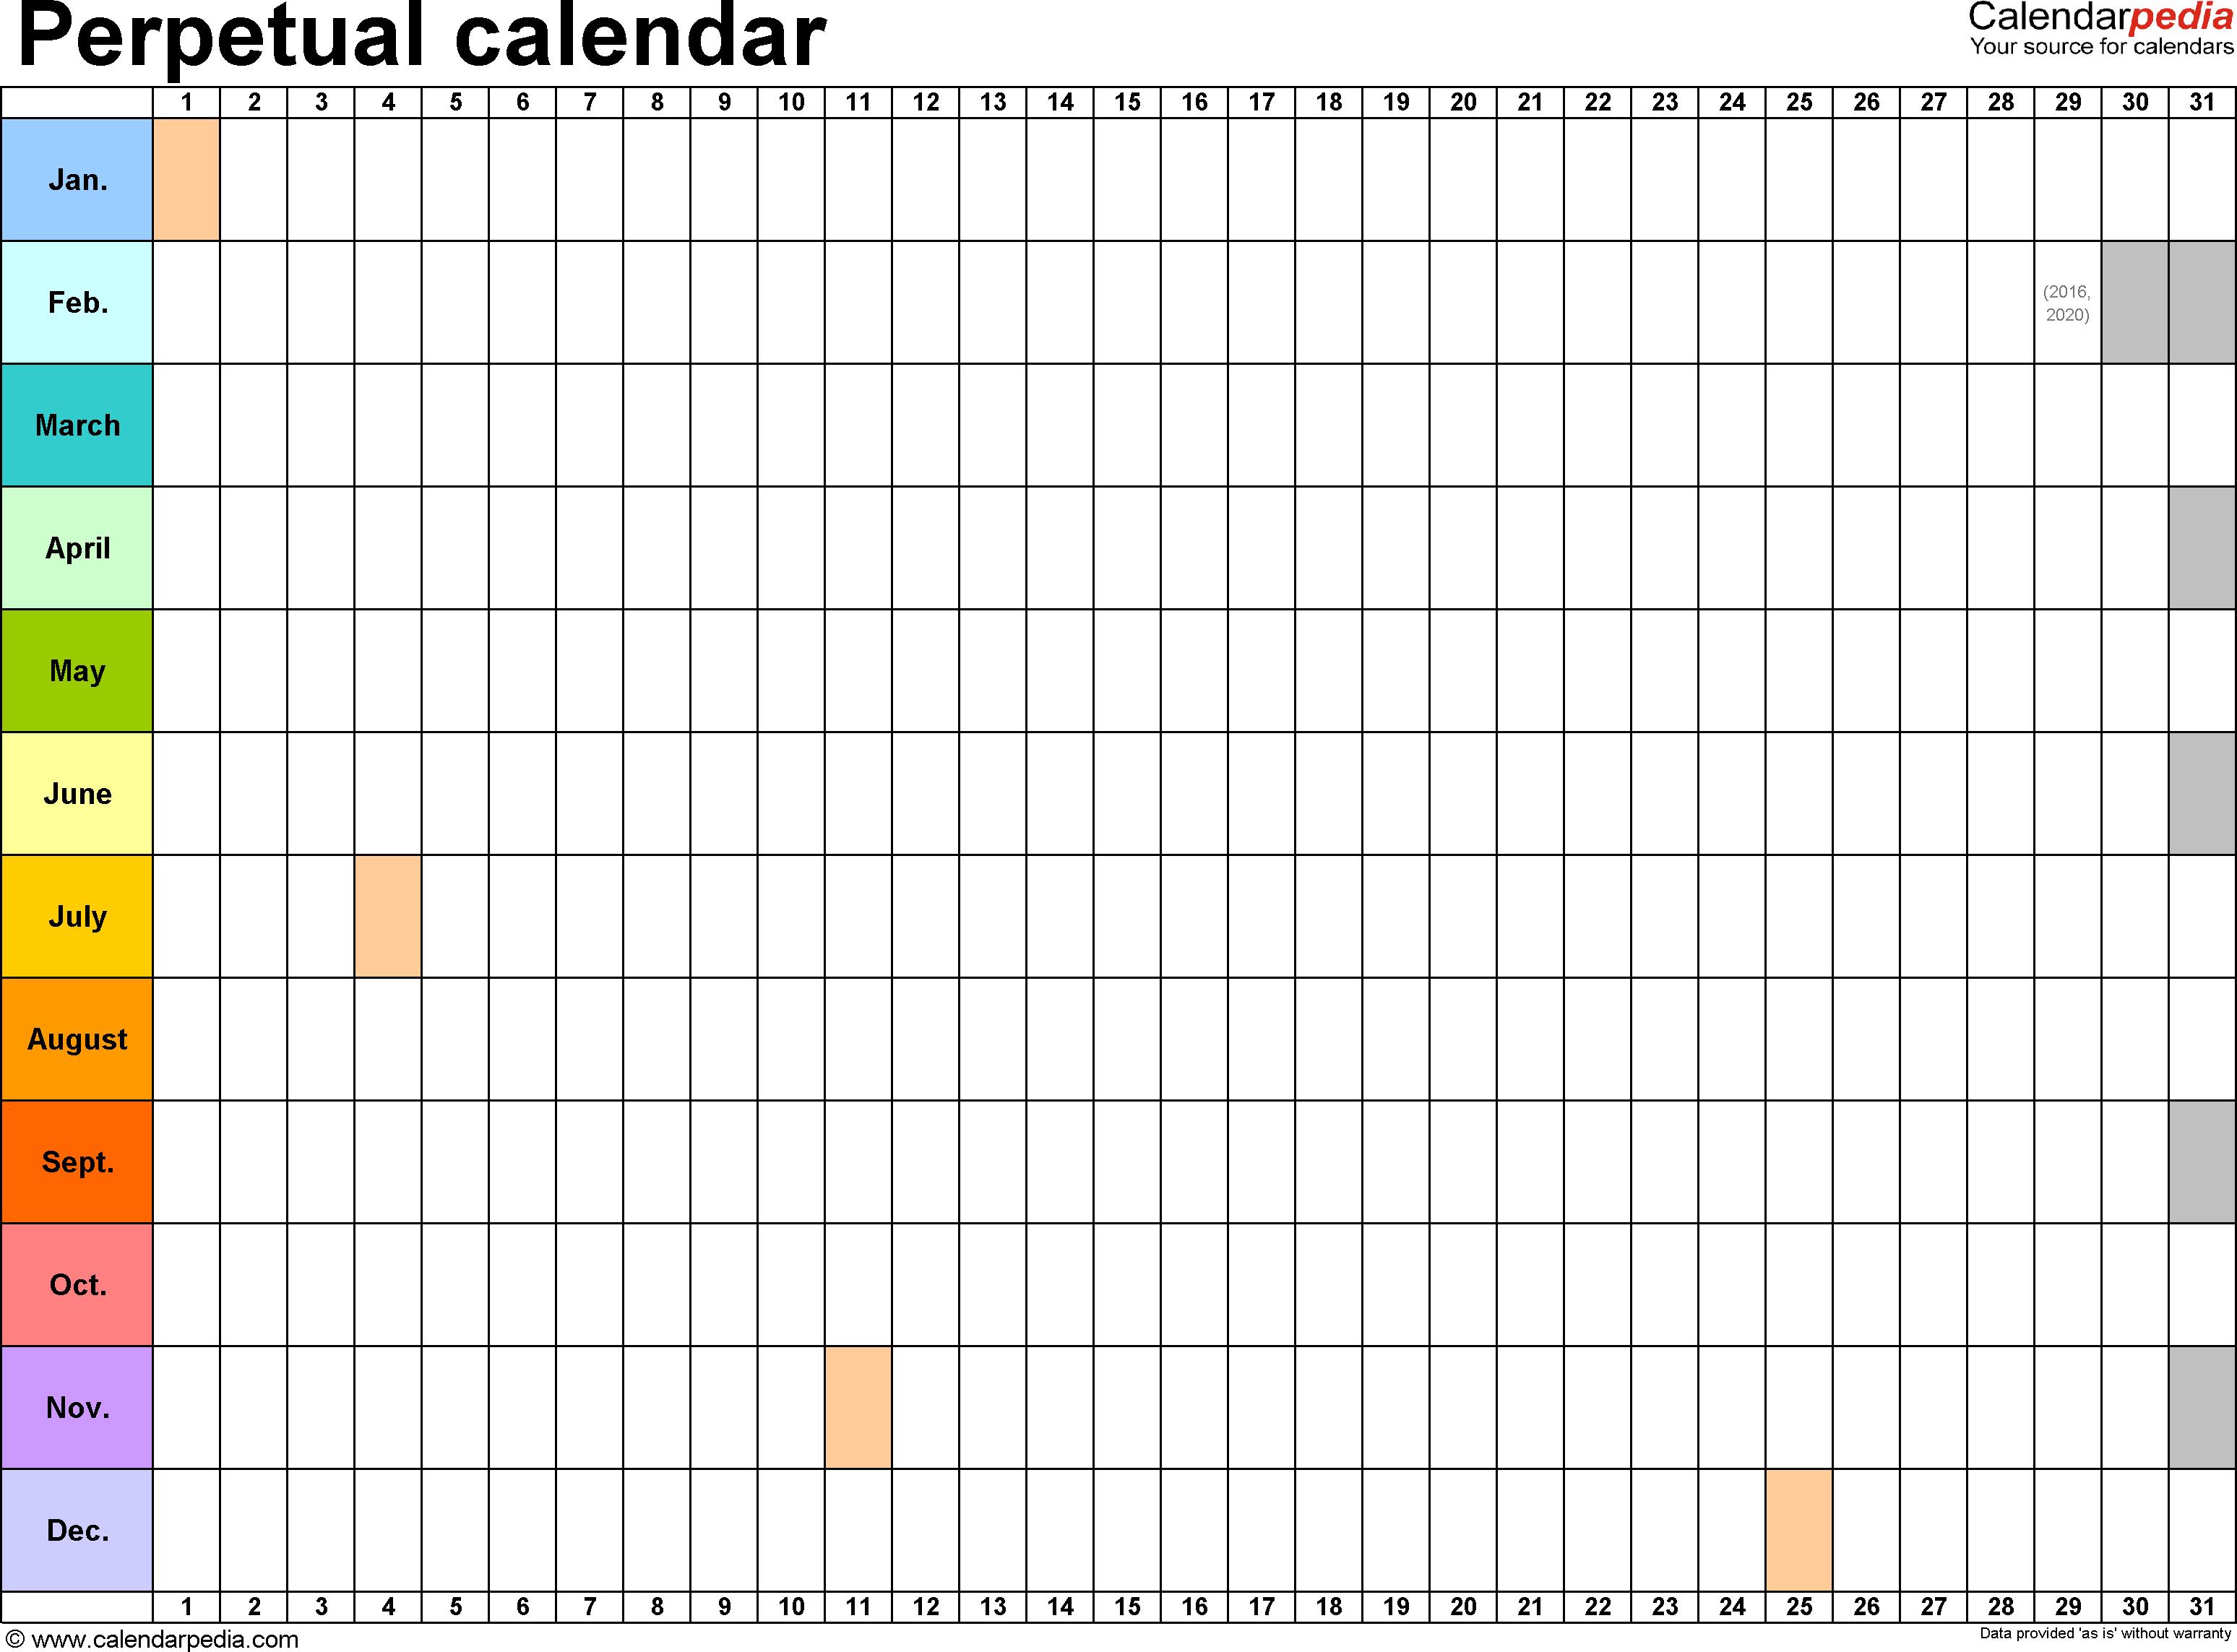 Template 2 Word Template For Perpetual Calendar Landscape Orientation 1 Page Calendar Template Blank Calendar Blank Calendar Template